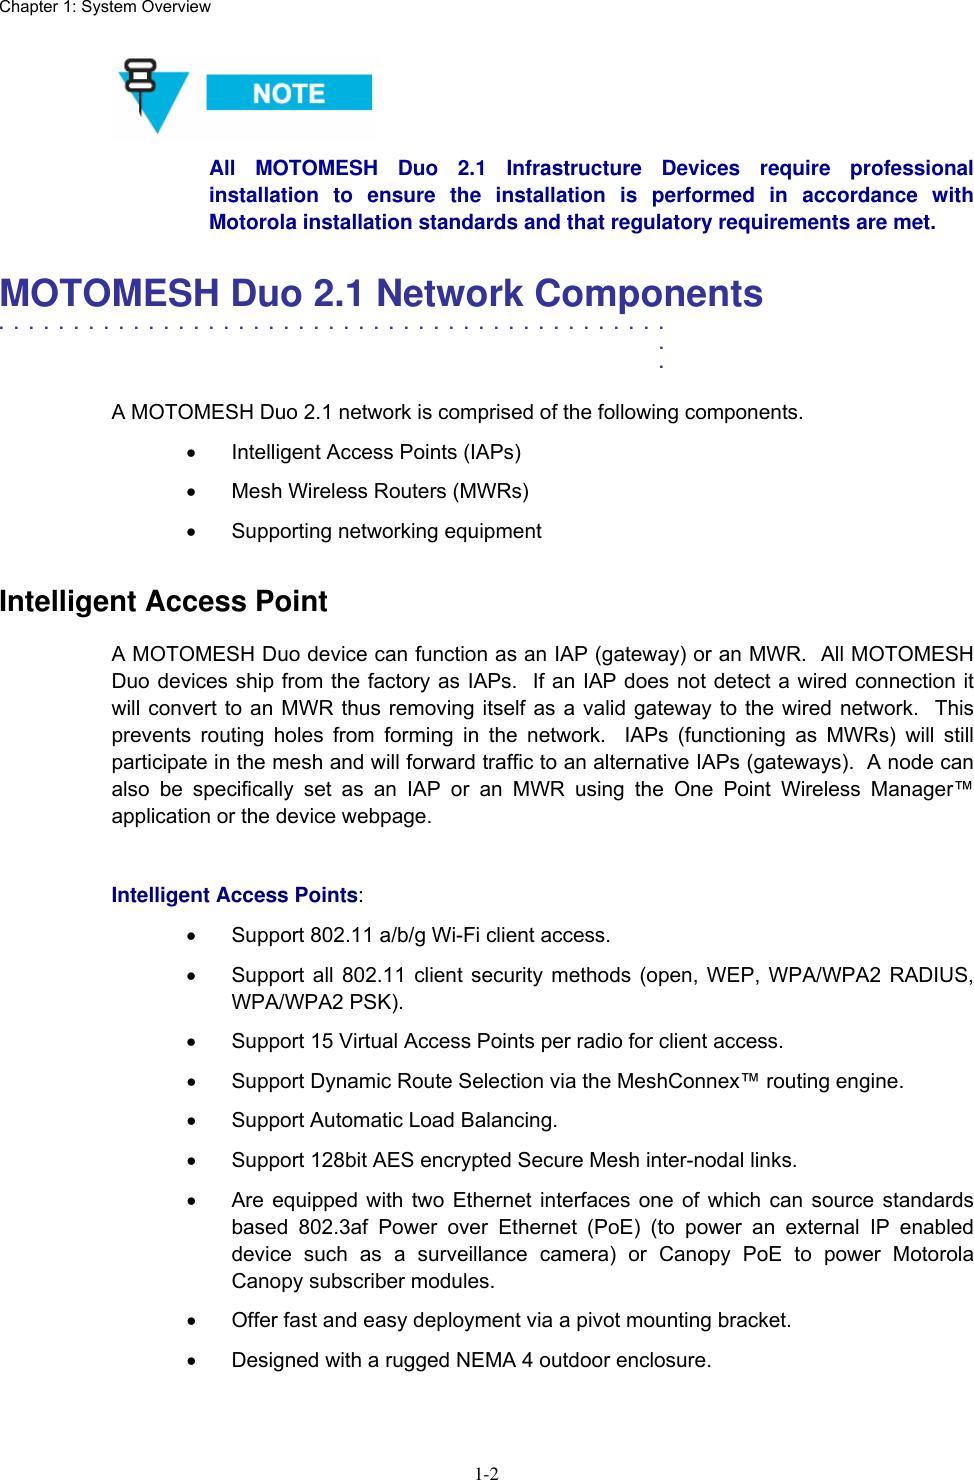 Motorola 2 1 Users Manual MOTOMESH Duo 2 1 Network Setup And